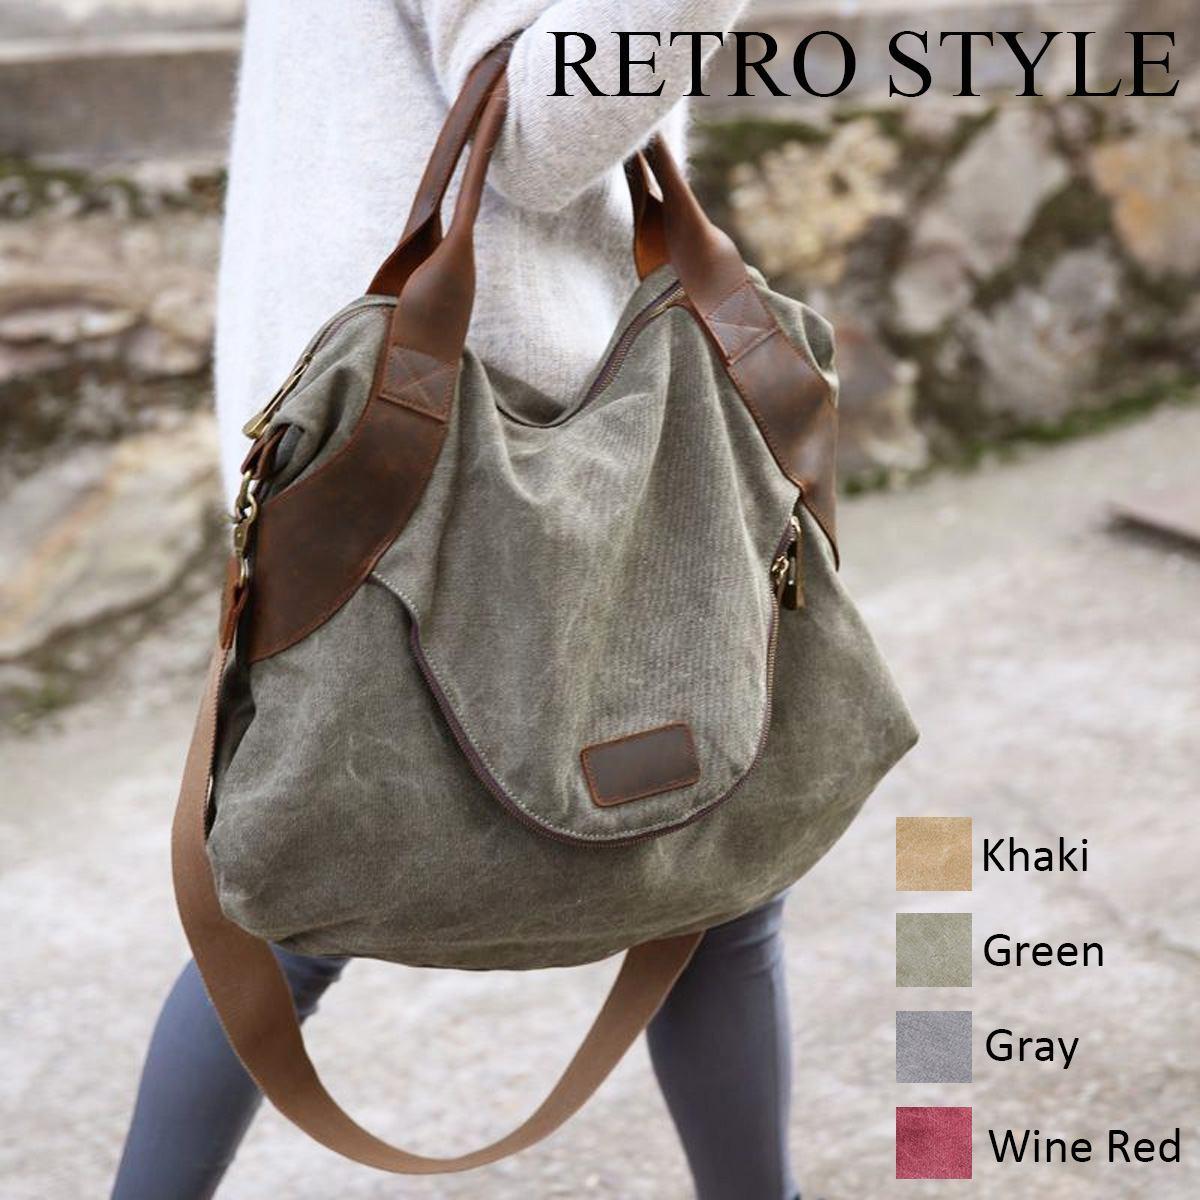 Large Pockets Casual Tote Women s Handbag Shoulder Handbags Canvas Leather Capacity Bags For Women